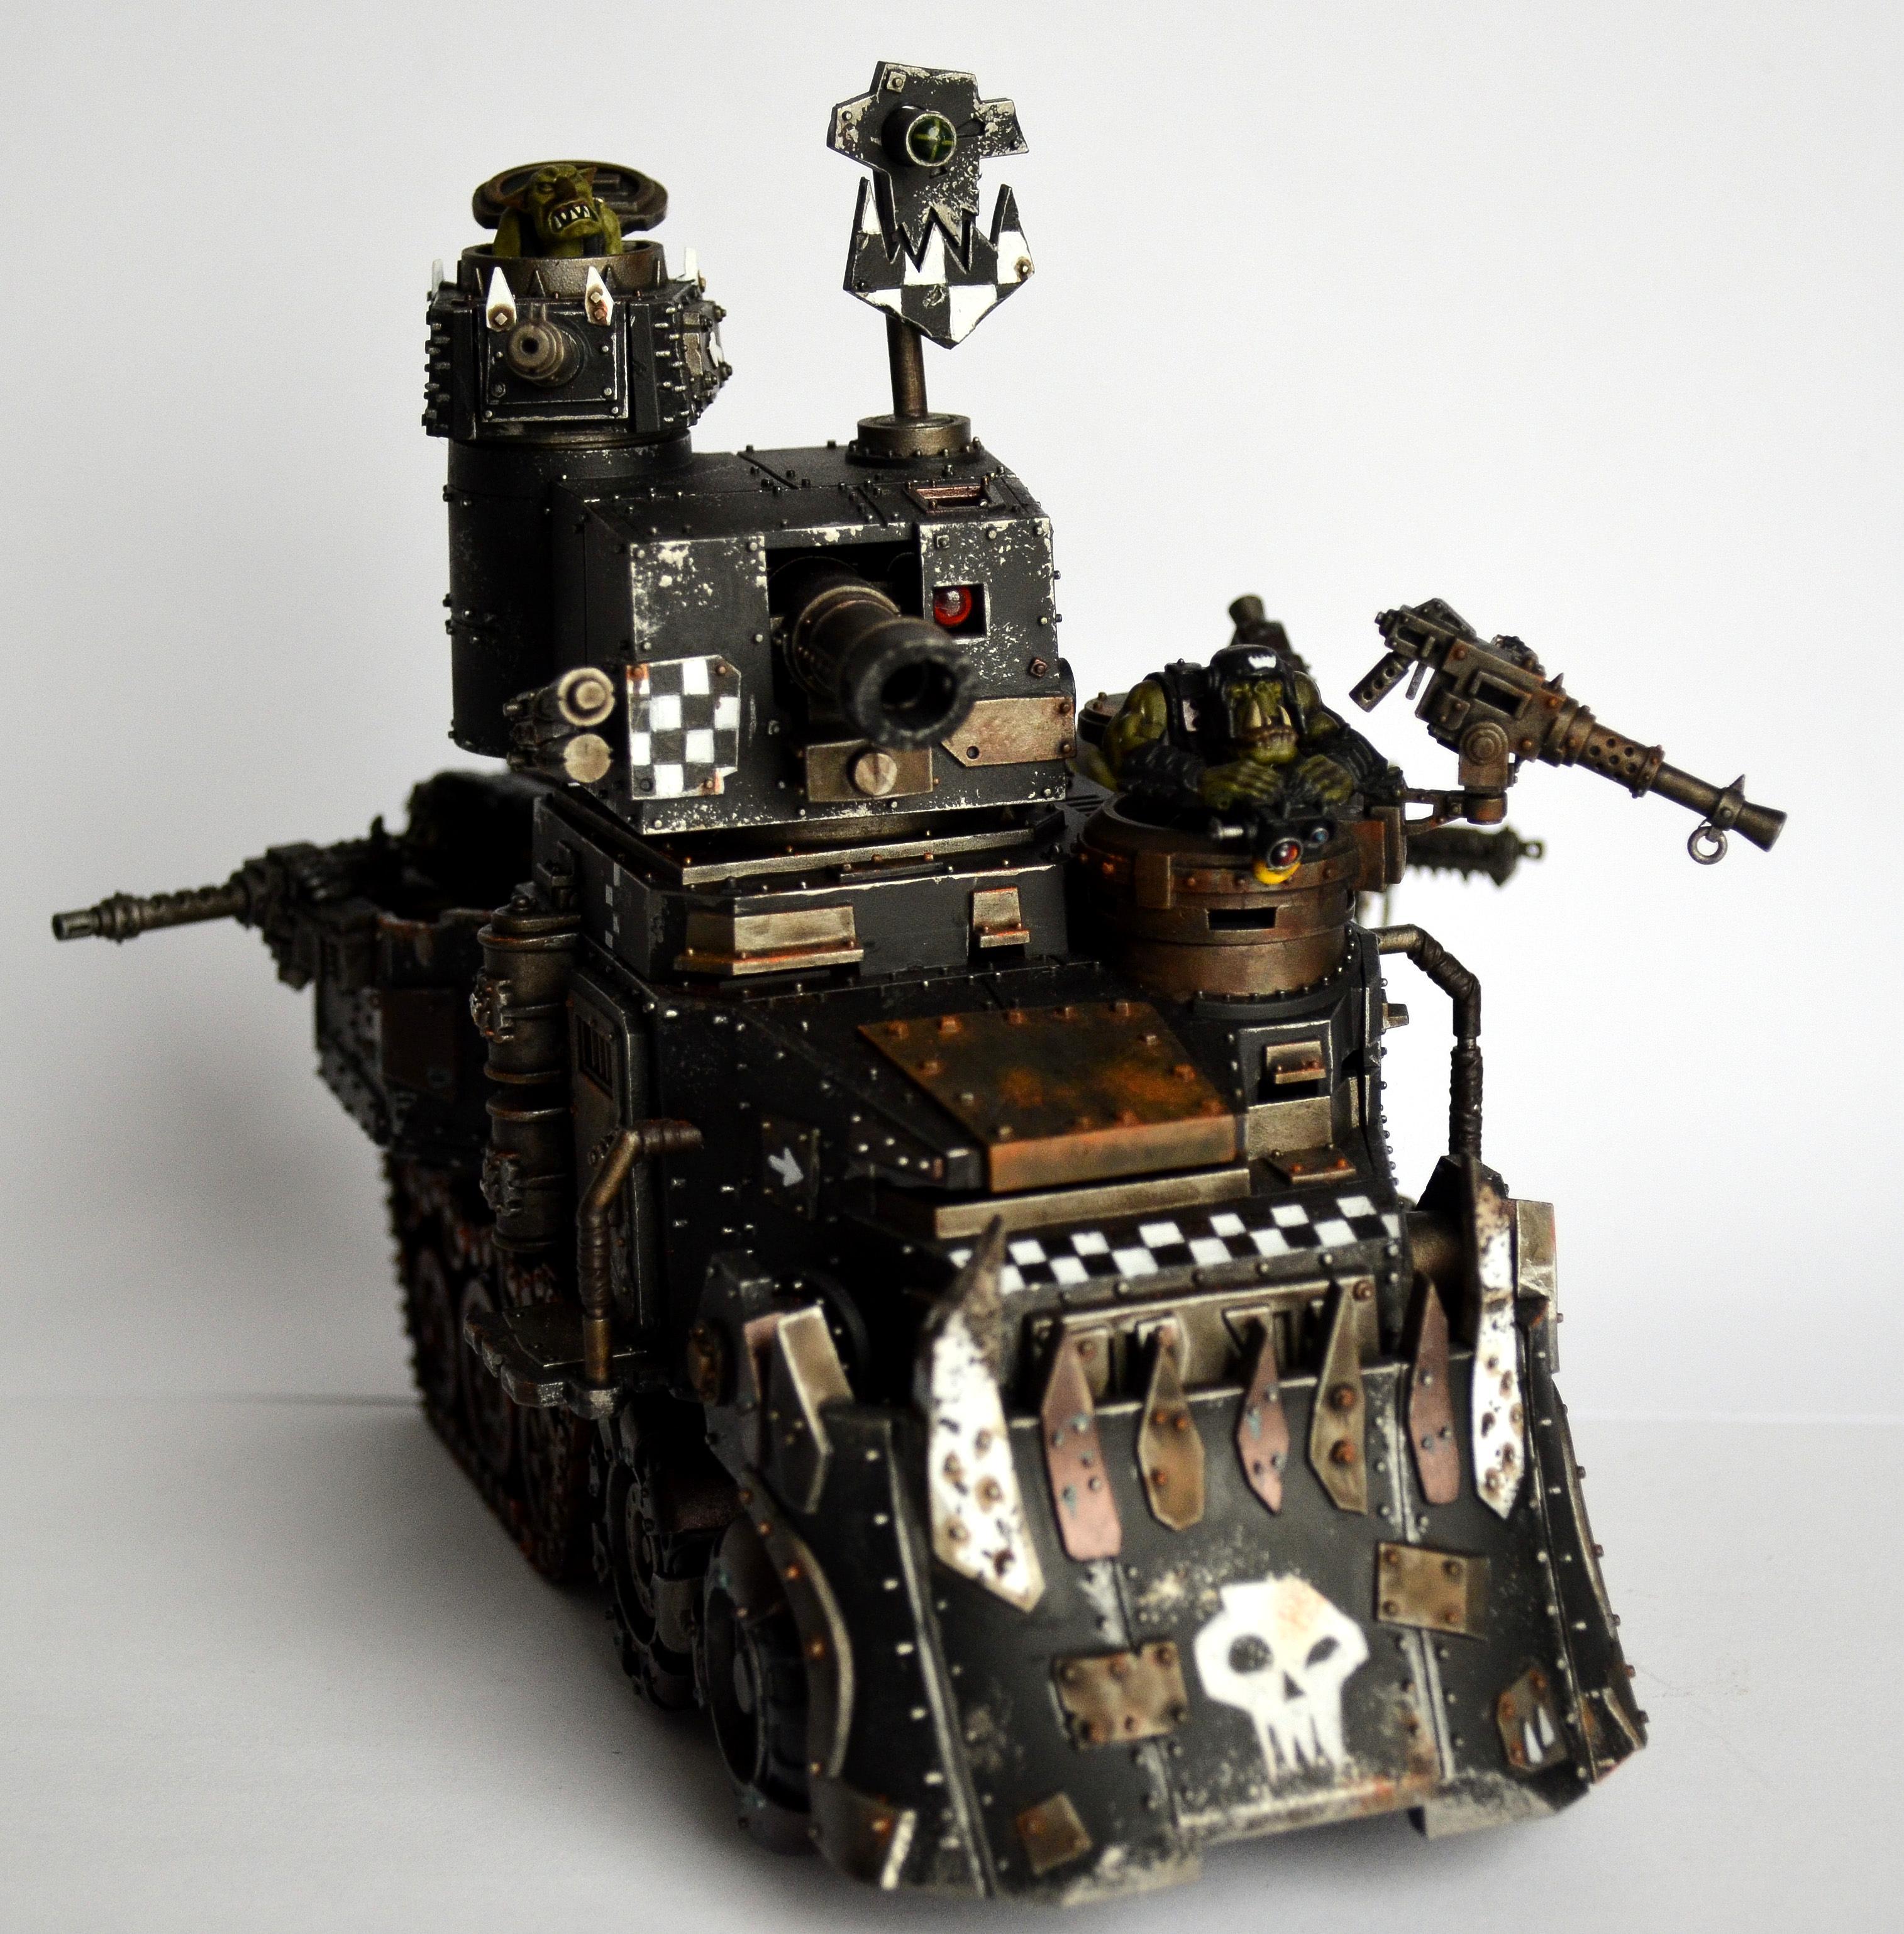 Dark, Goff, Goffs, Grim, Industrial, Mega Armor, Orks, Power Klaw, Realistic, Waaagh! Cheques, Warboss, Warhammer 40,000